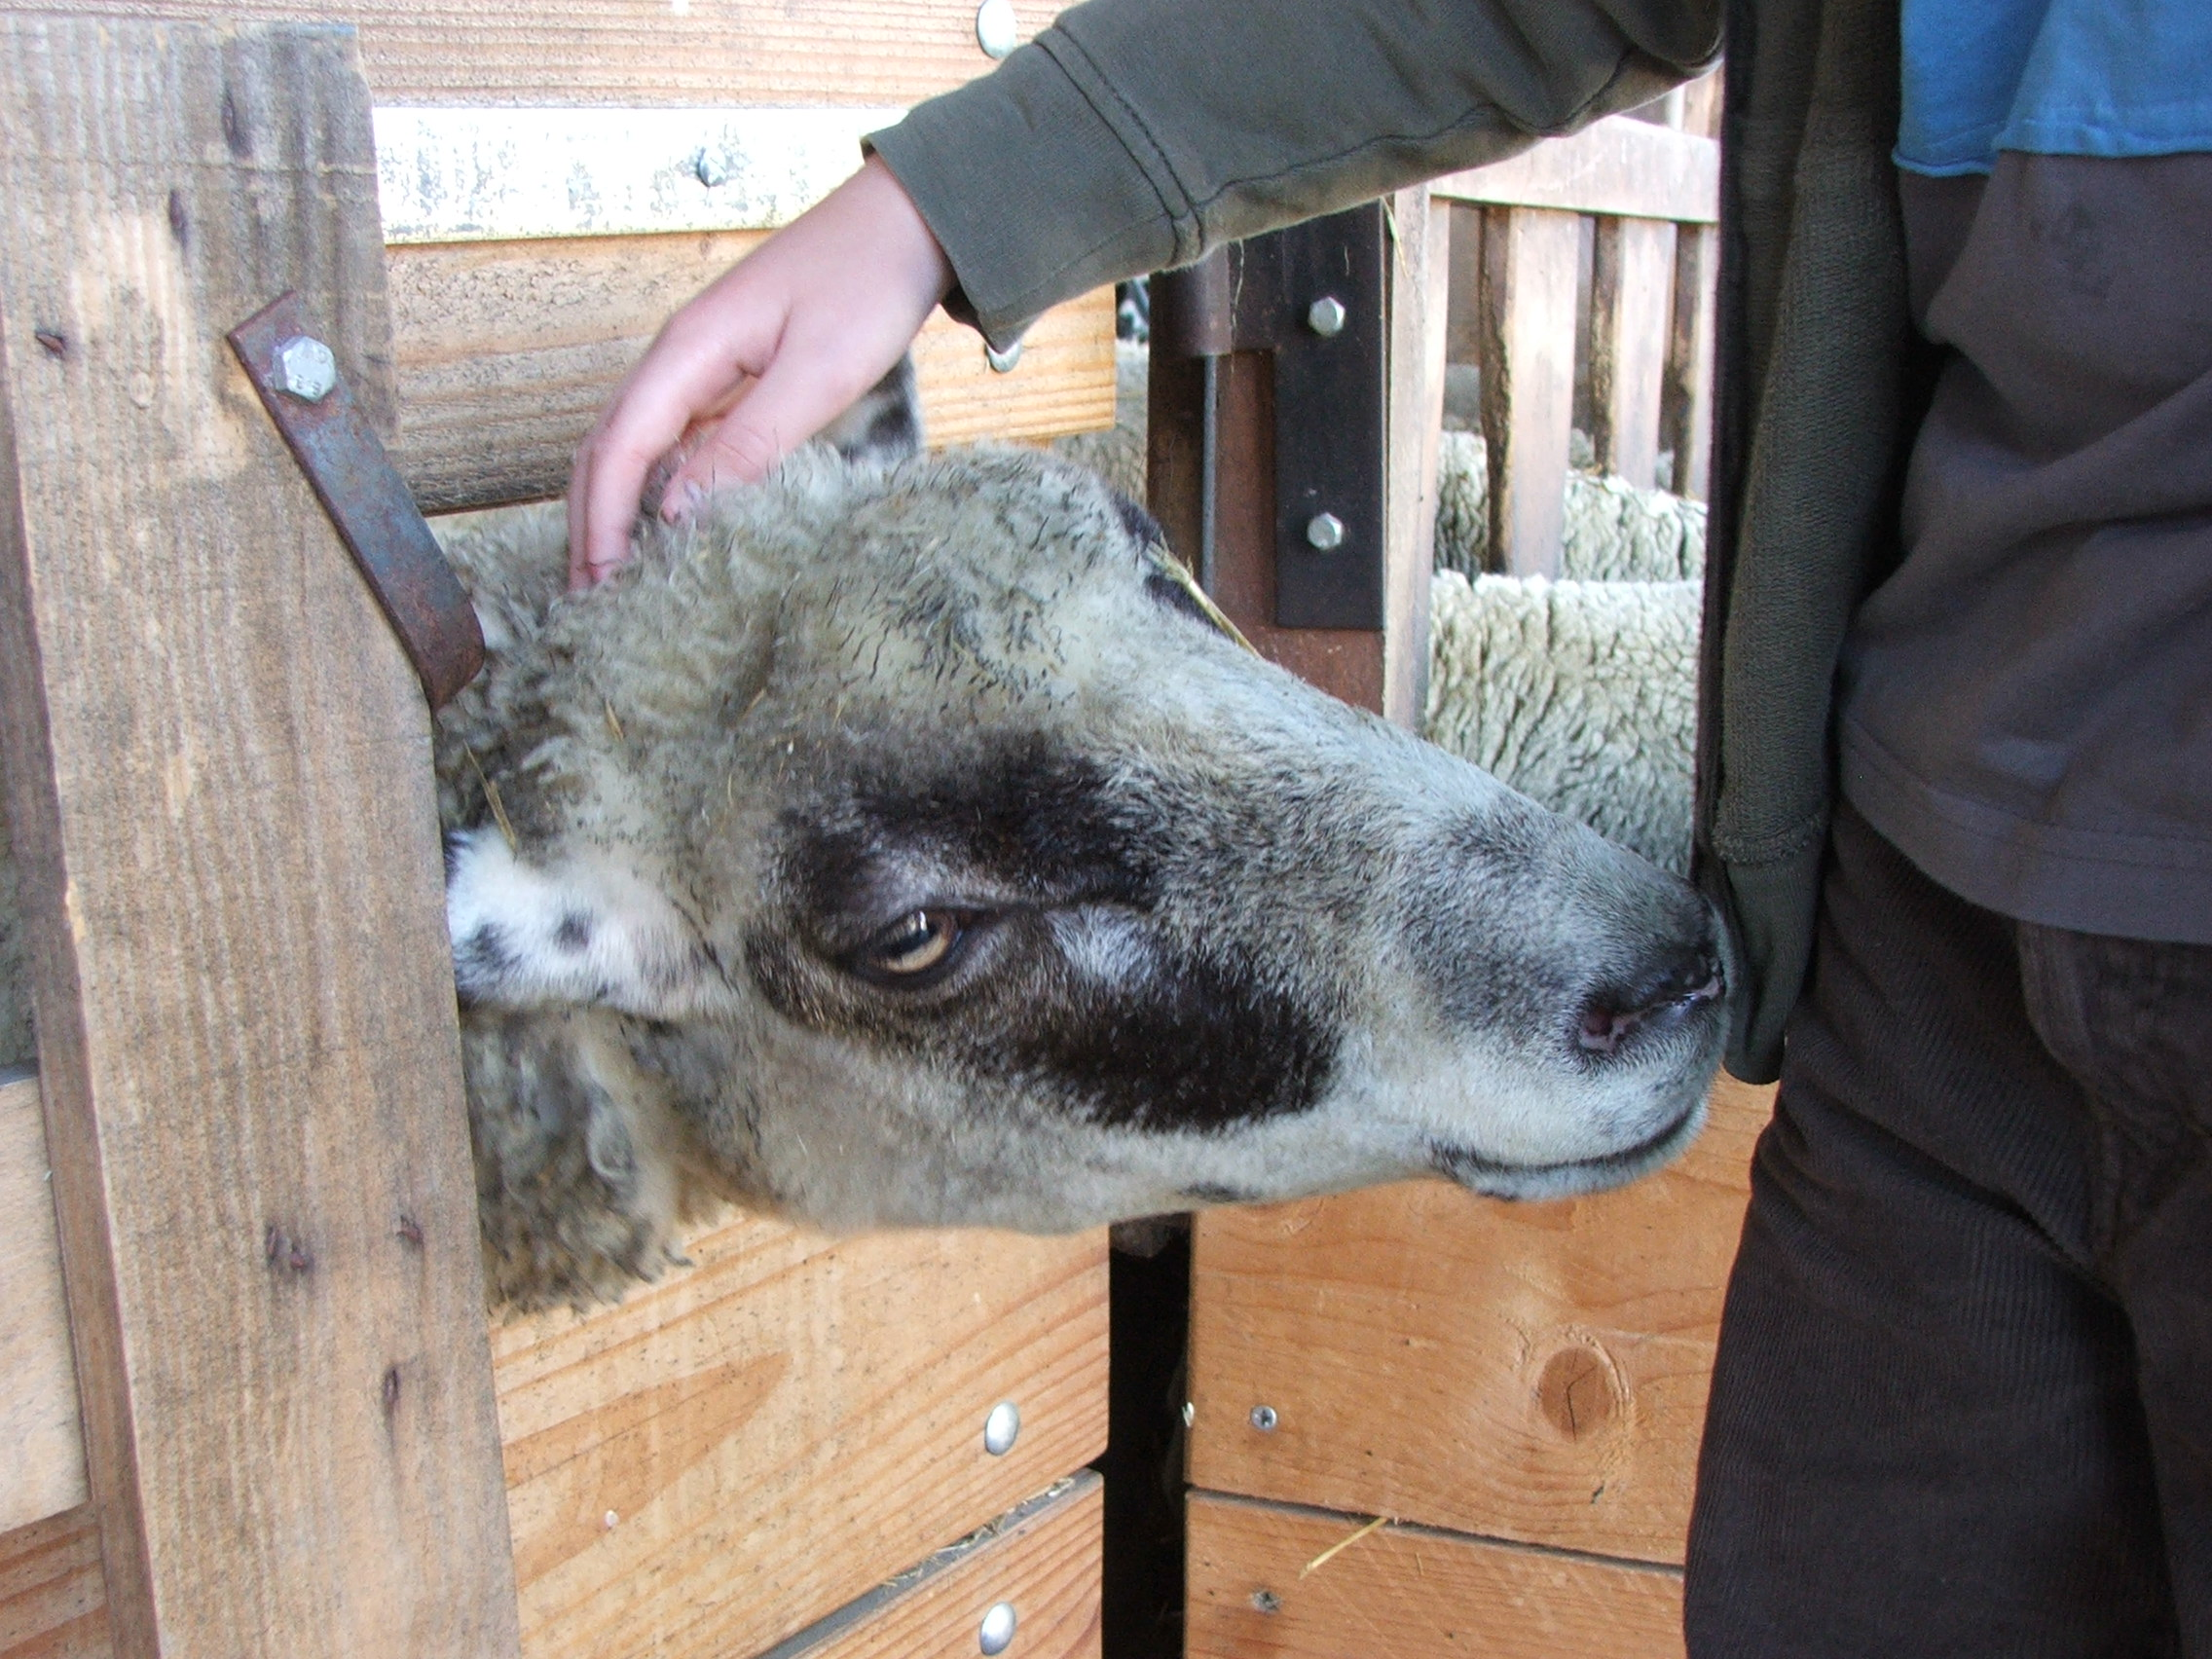 Tonte laine premi re date de l 39 ann e 2016 la bergerie for Tarif tonte pelouse 2016